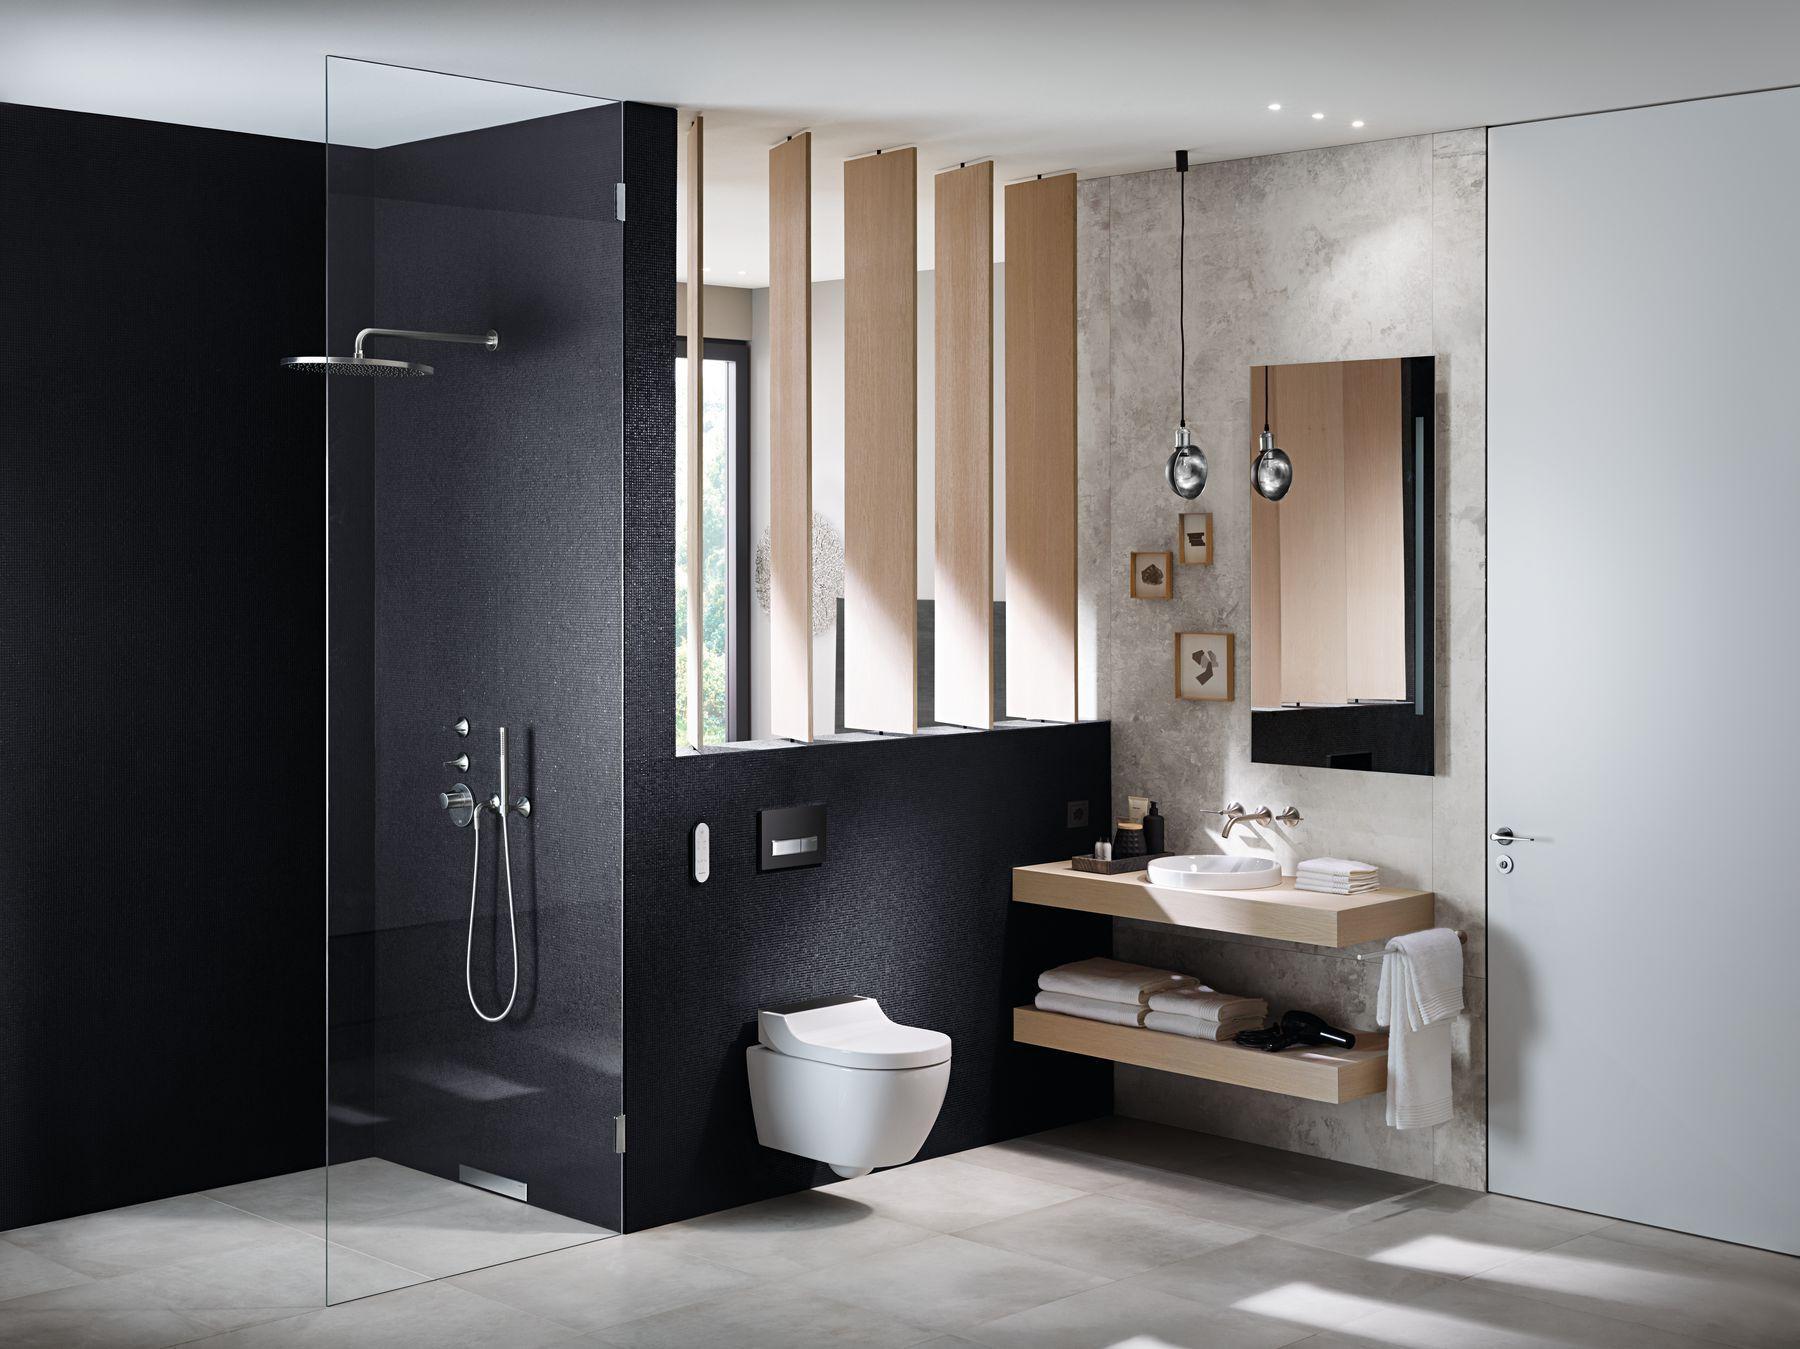 Badkamer Interieur Design : Sphinx variform sphinx wastafel sanitair badkamer